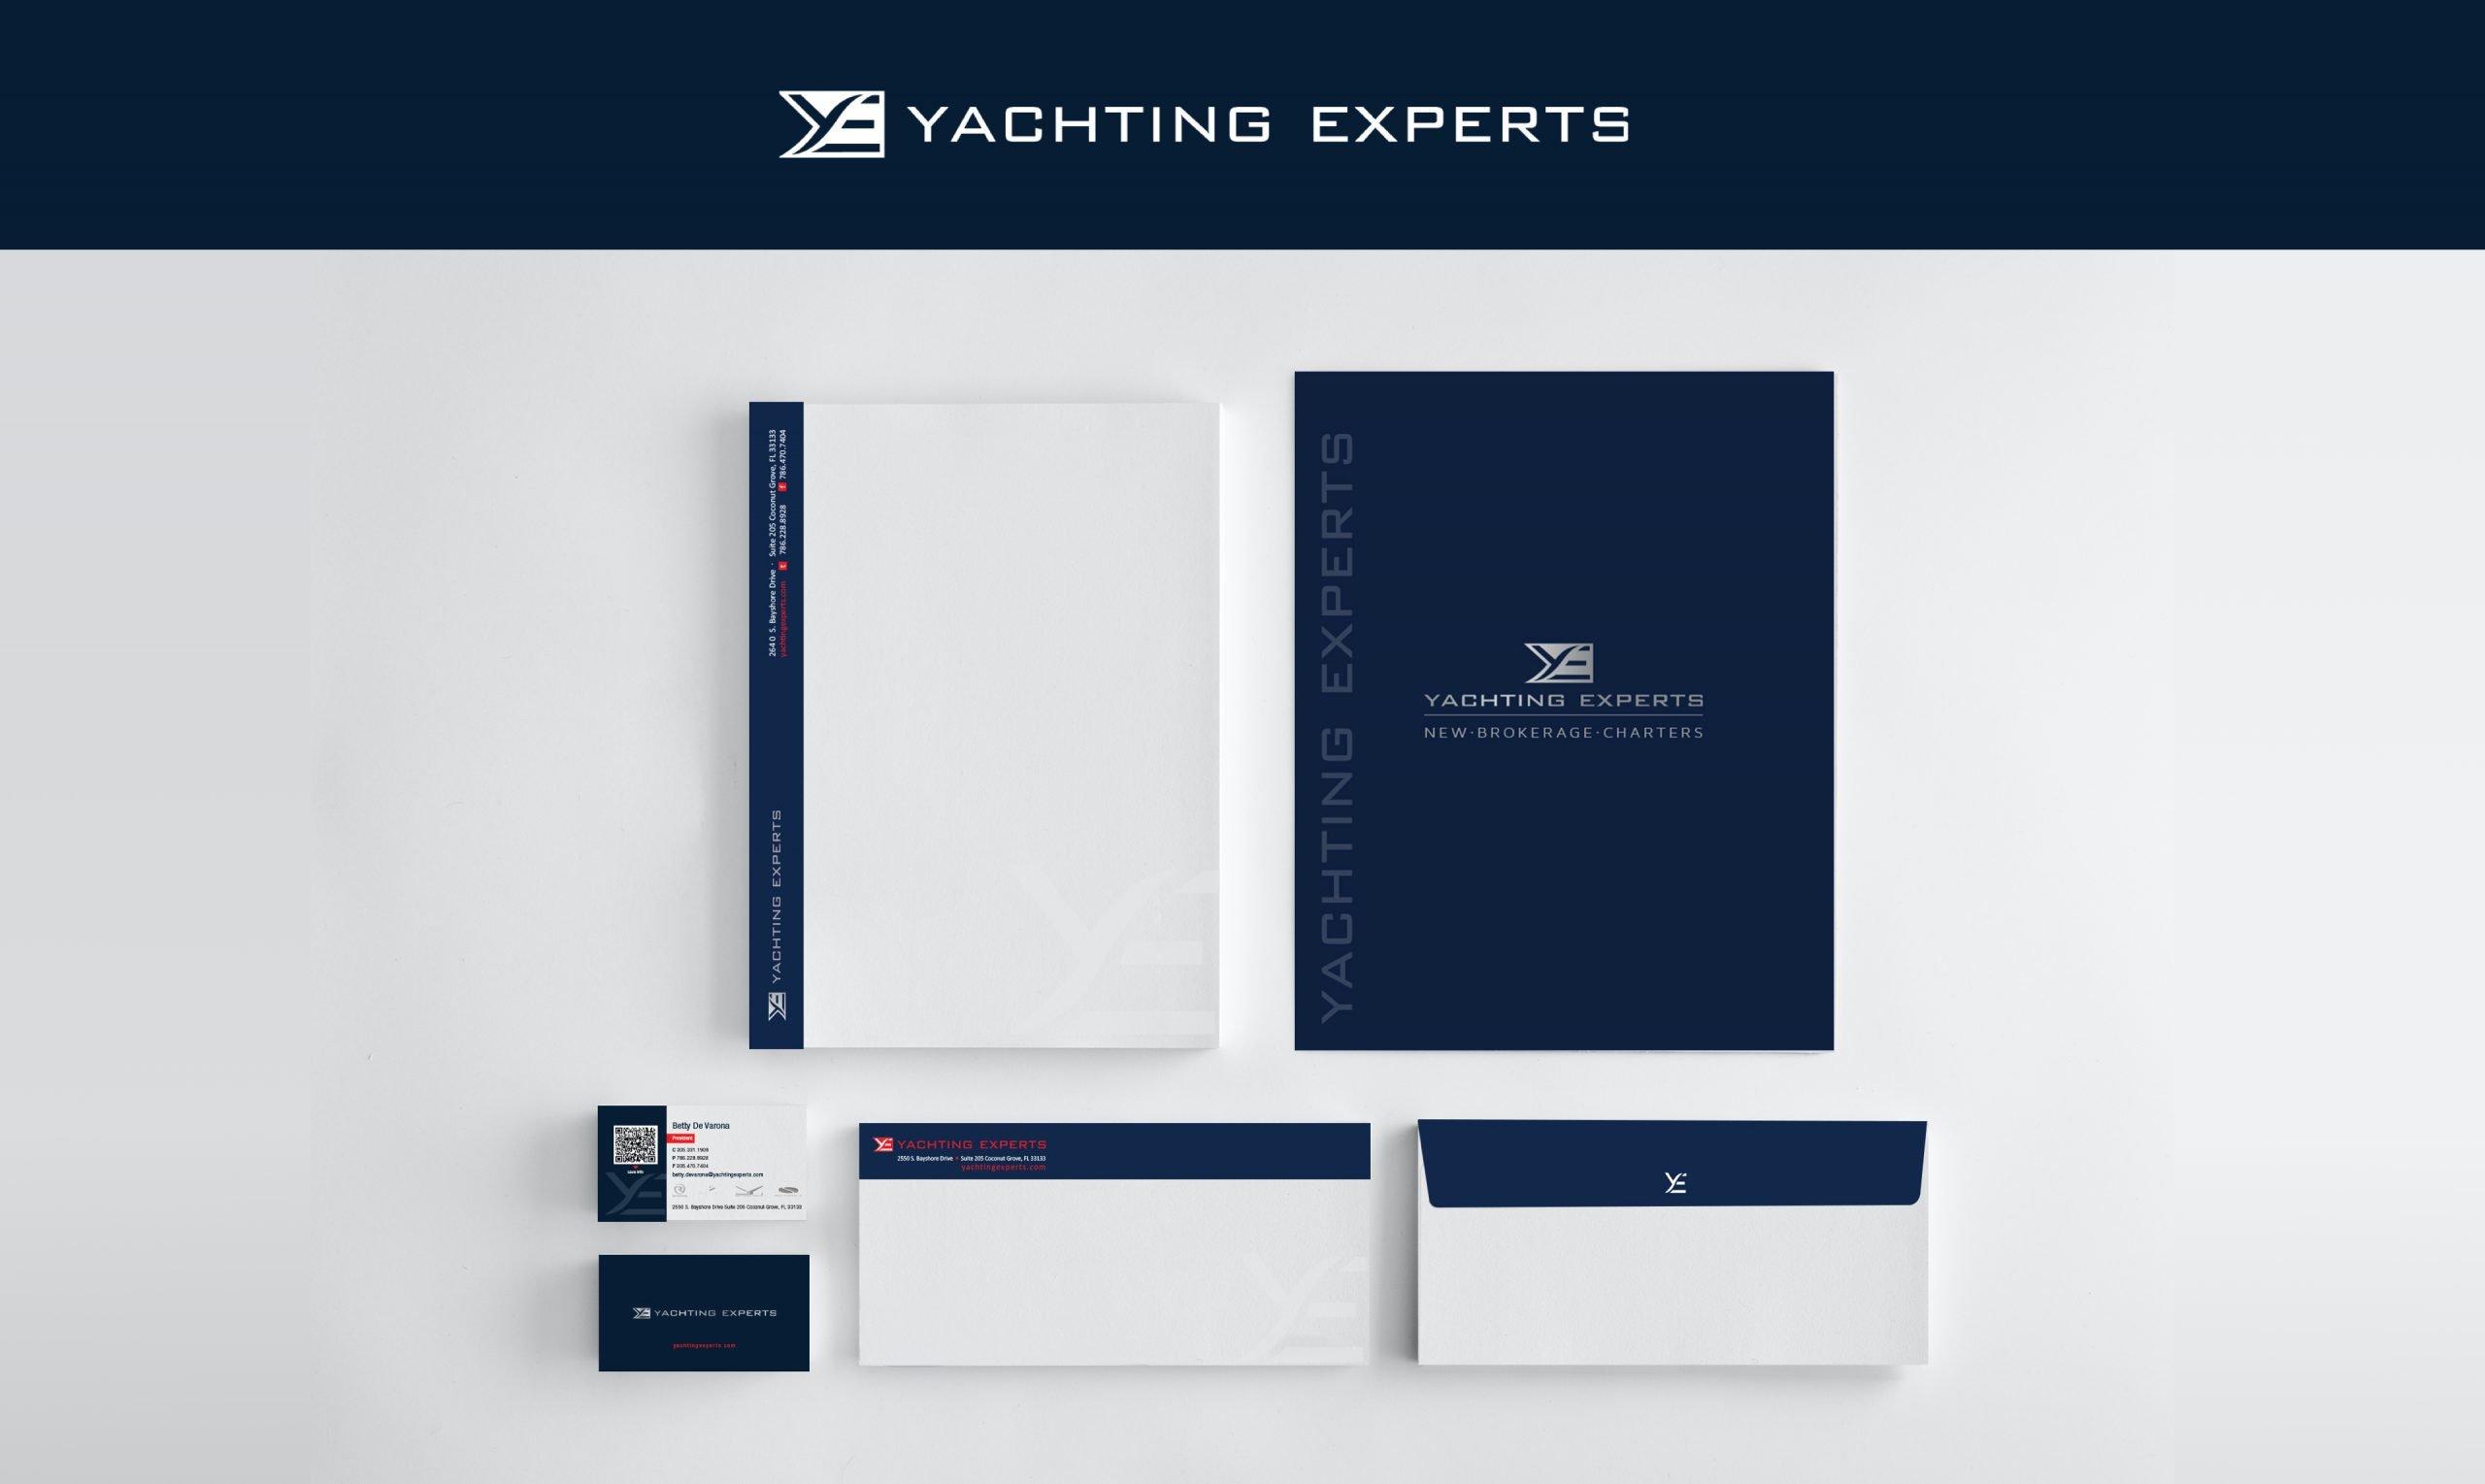 Yachting Experts Branding Identity Materials